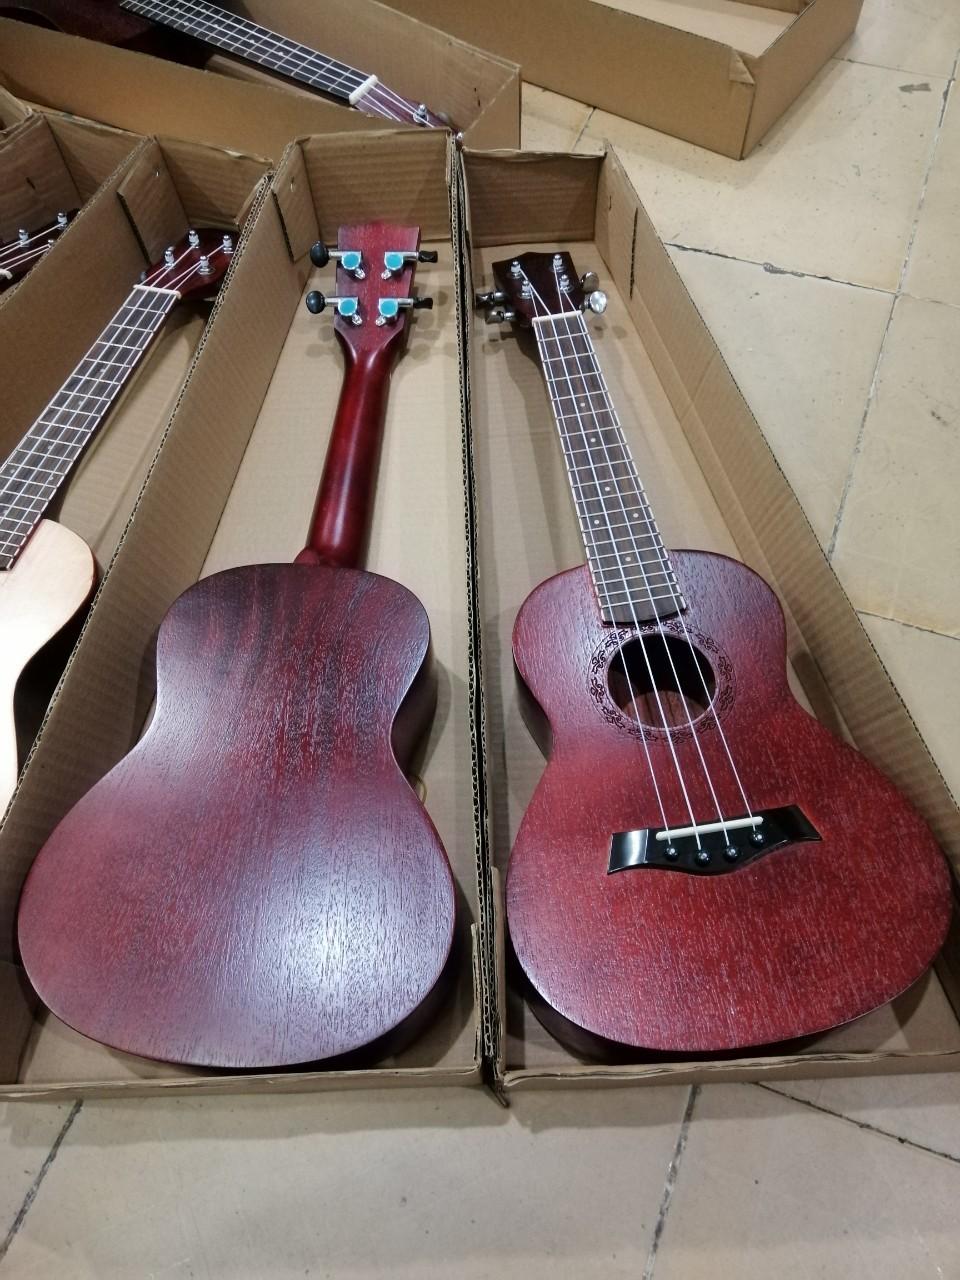 dan-ukulele-la-gi-chon-mua-dan-ukulele